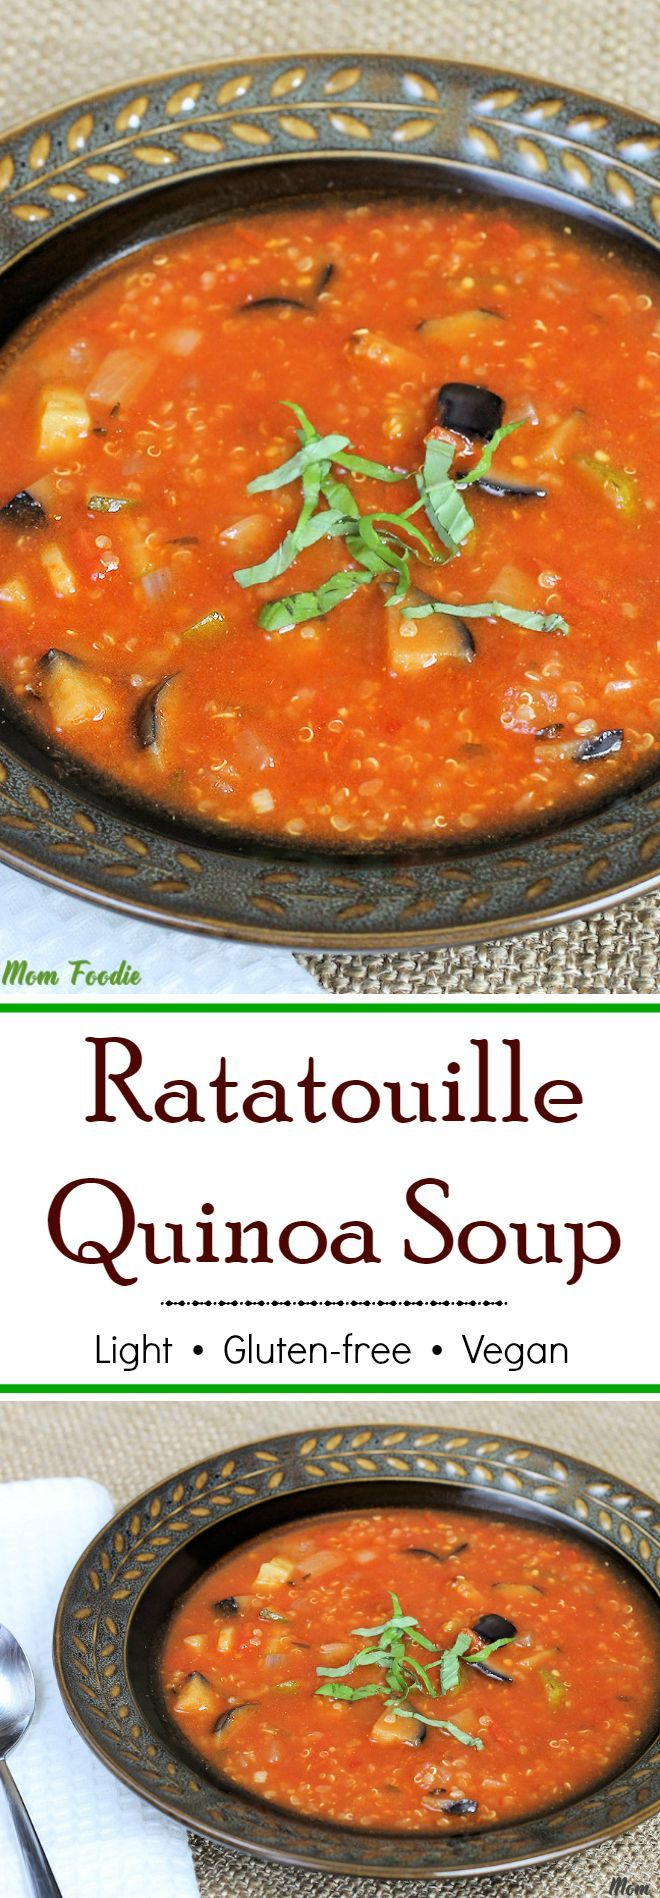 496 best diet recipes images on pinterest against all grain light ratatouille quinoa soup gluten free vegan recipe forumfinder Images